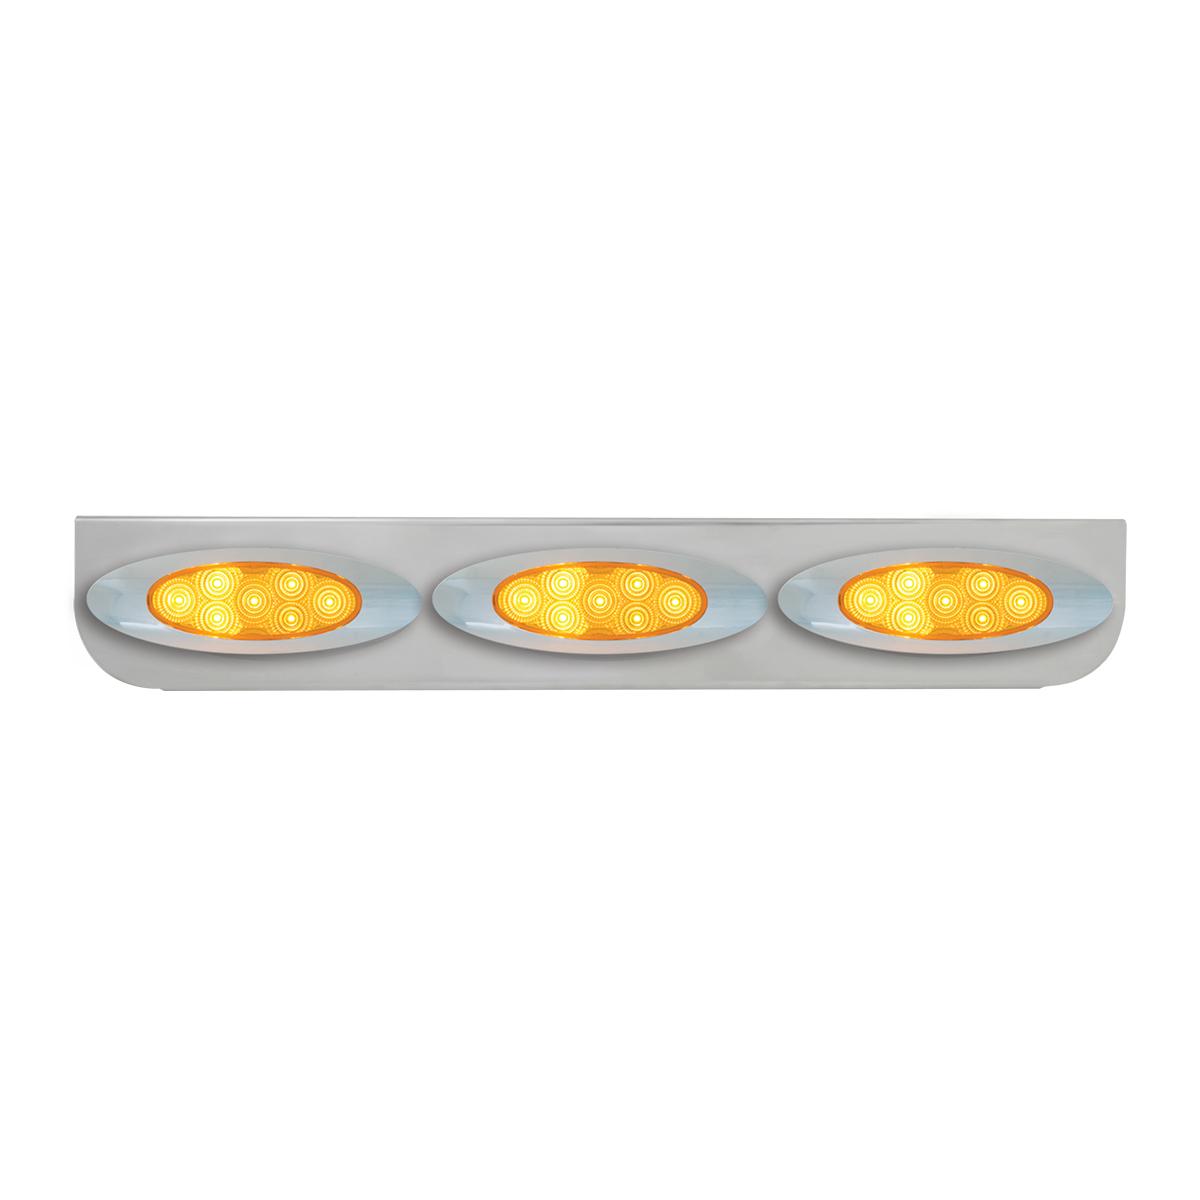 "#89066 Triple Stainless Steel ""L"" Shape Light Bracket with Plug-In Y2K Spyder LED Lights"